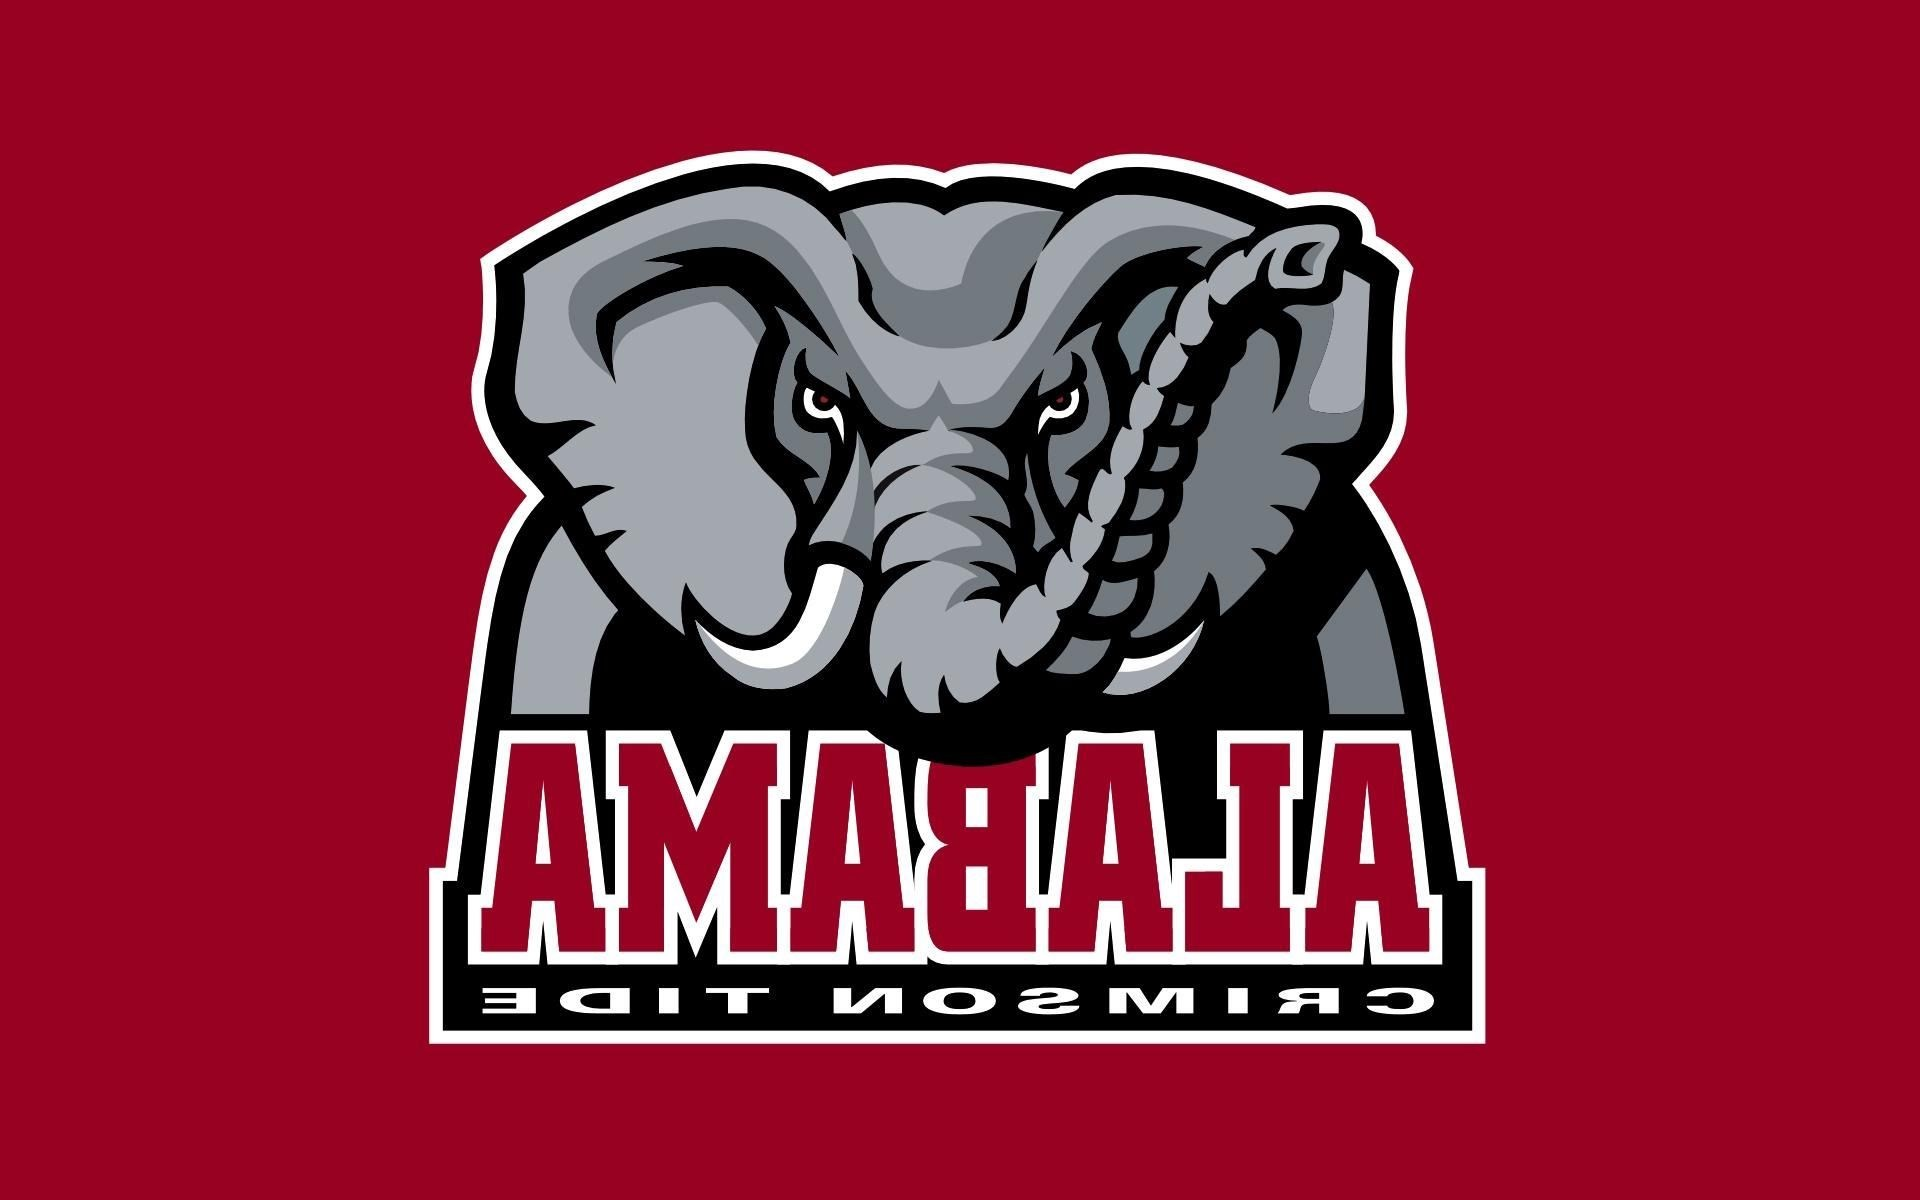 62 Alabama Crimson Tide